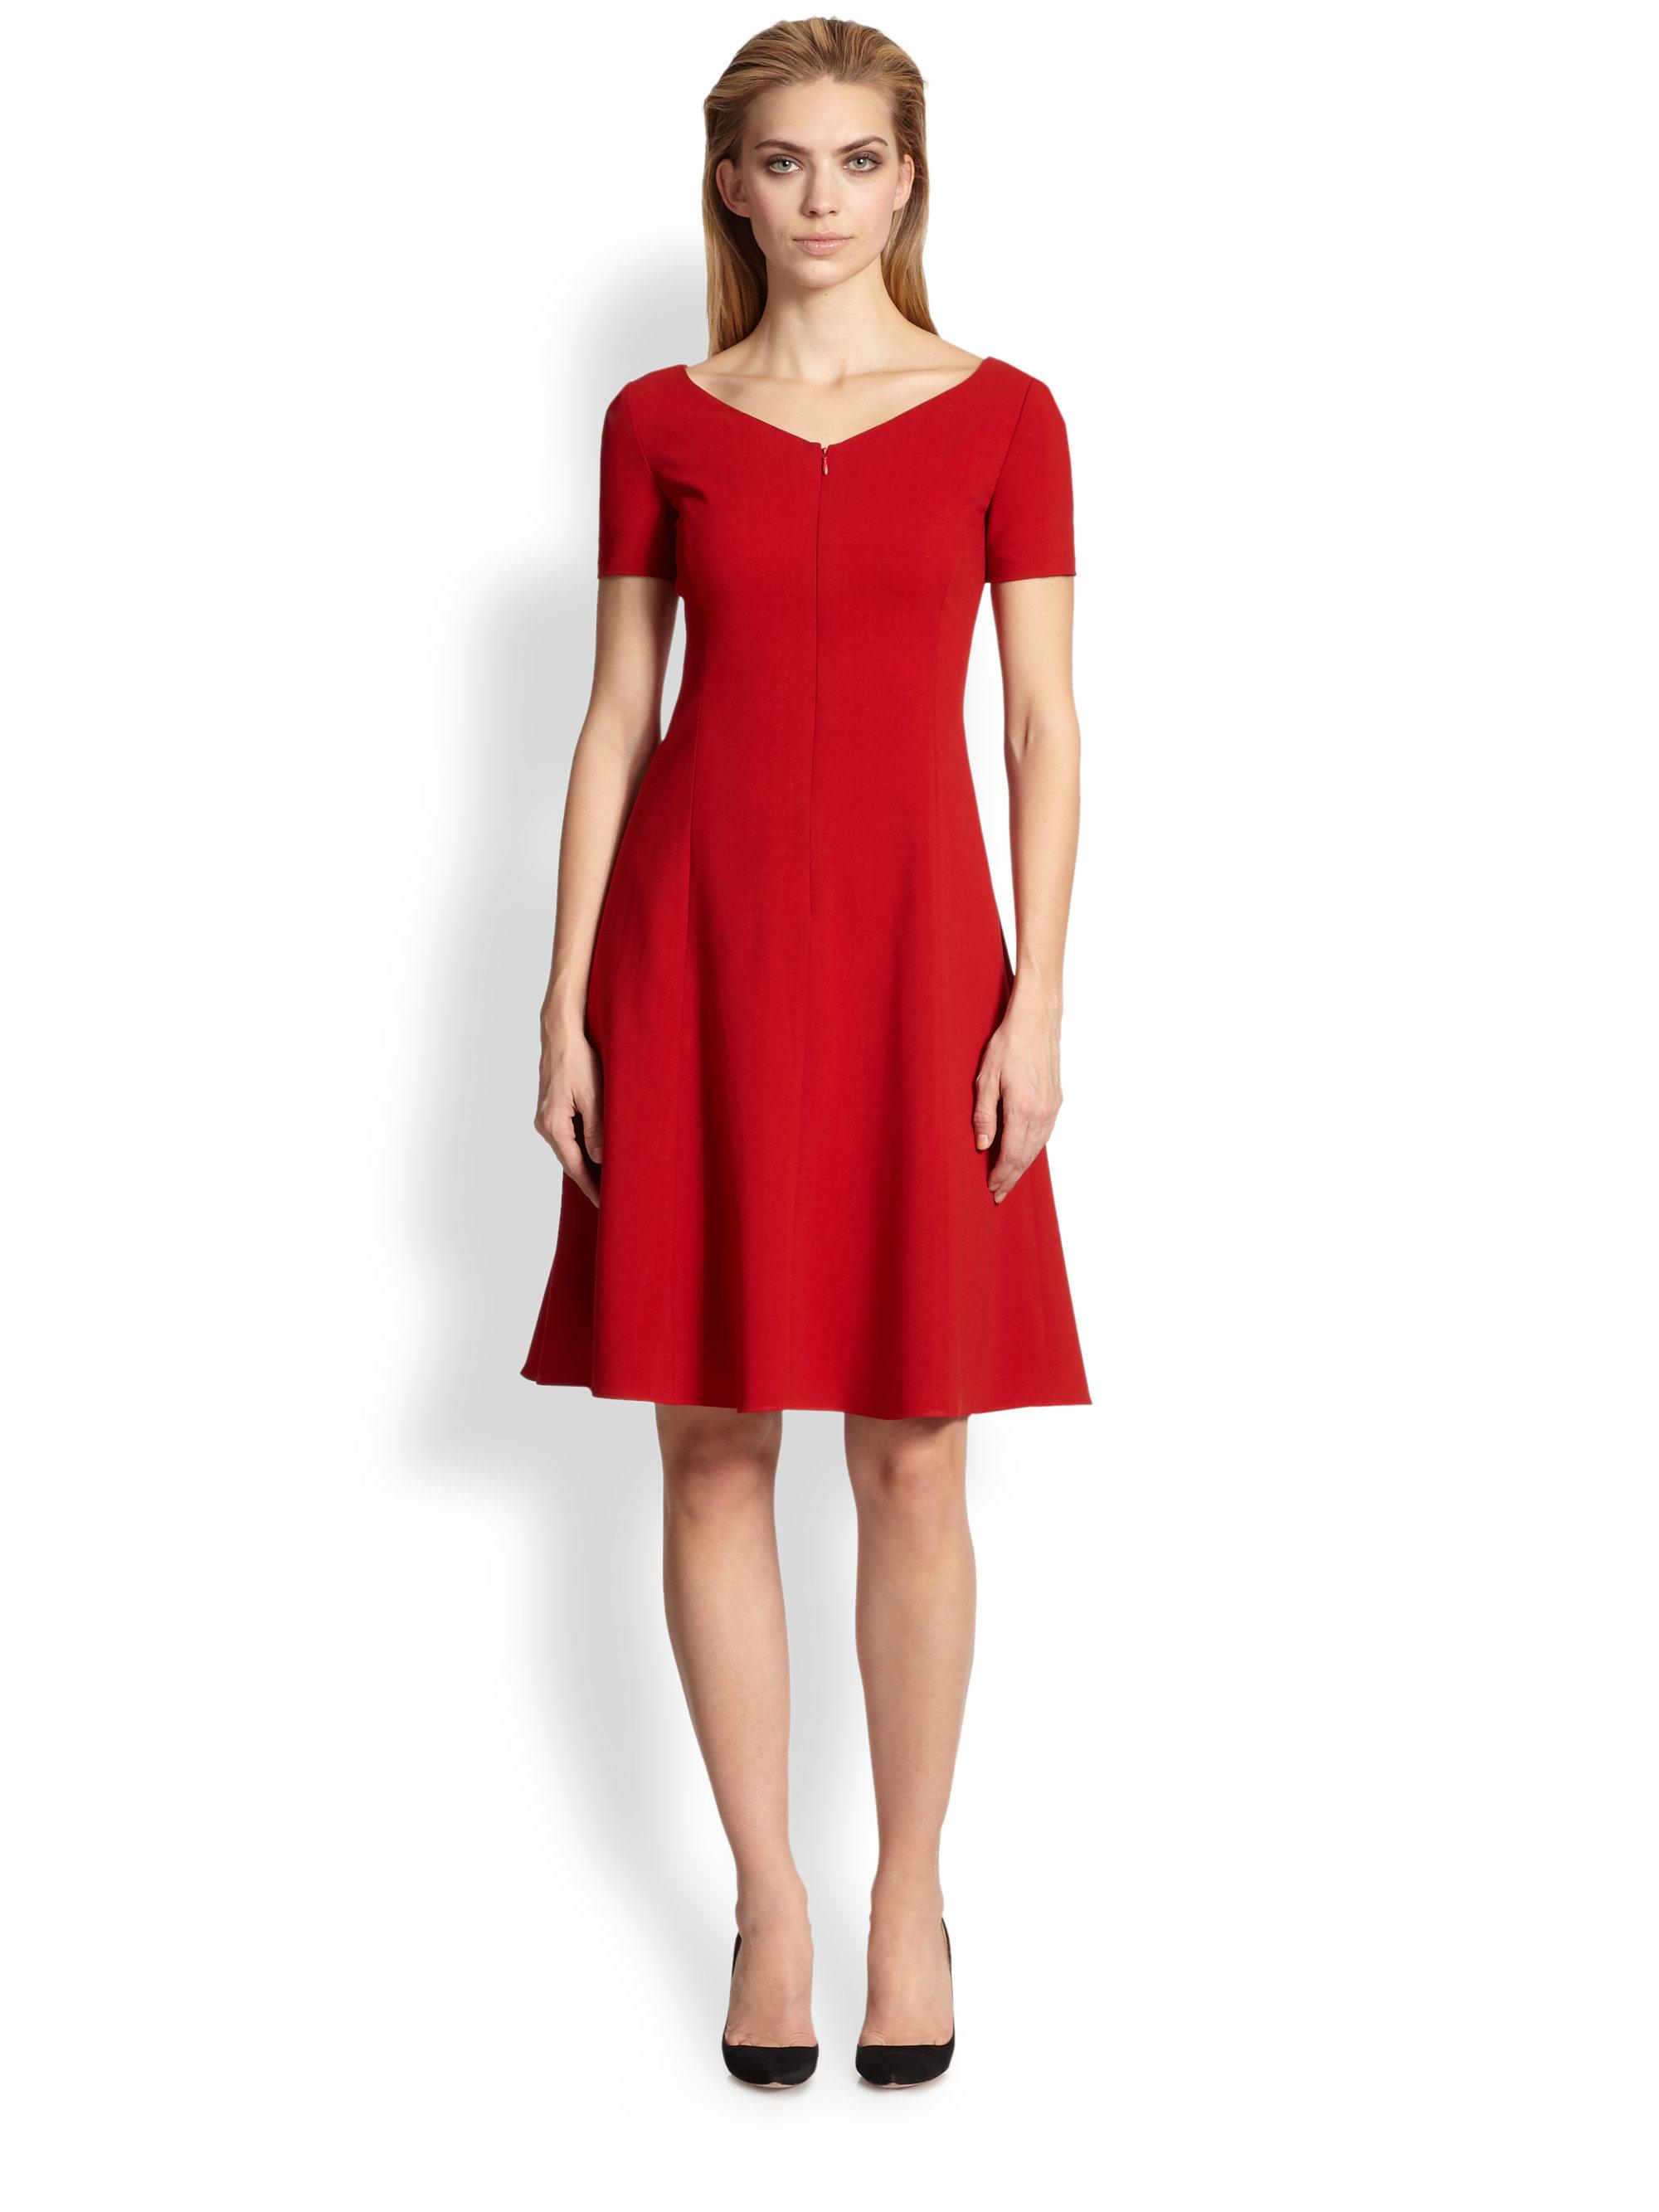 Armani Red Dress Cocktail Dresses 2016